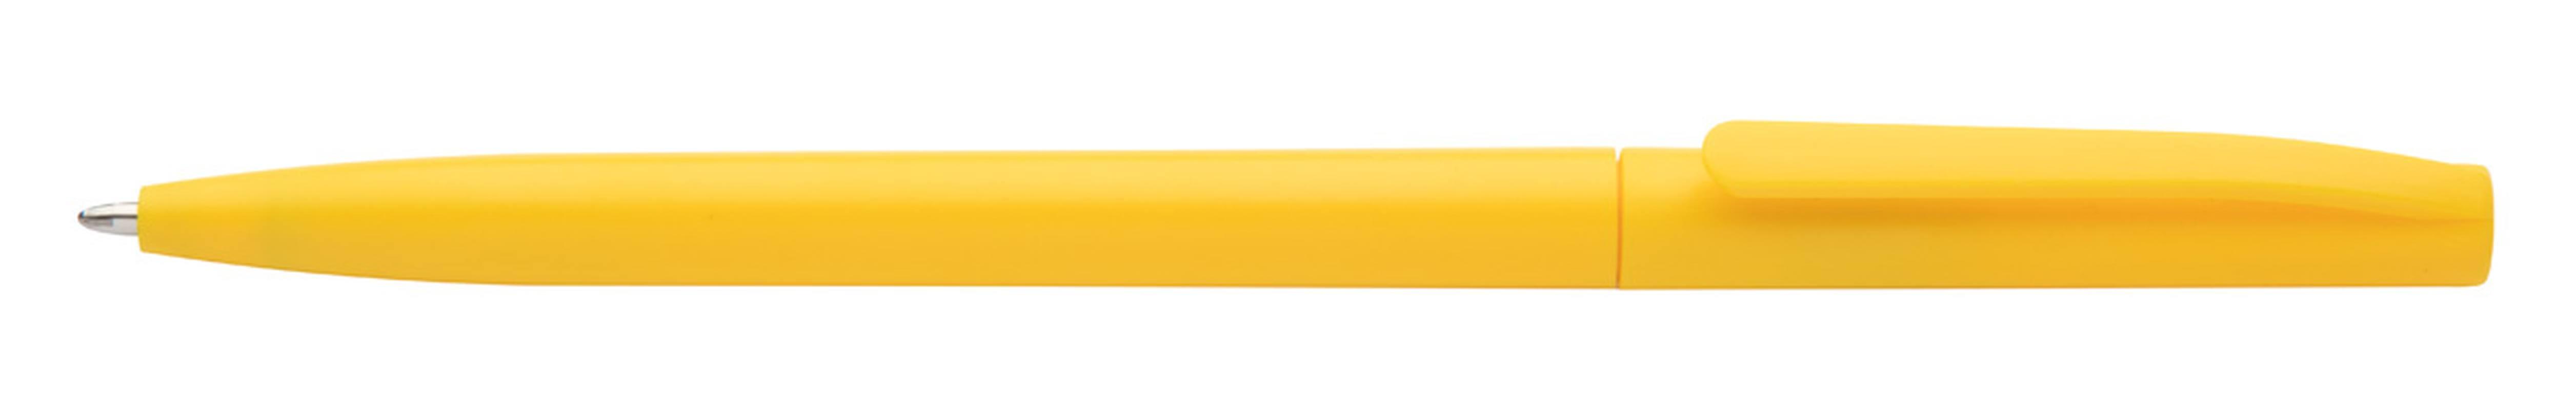 Swifty kuličkové pero